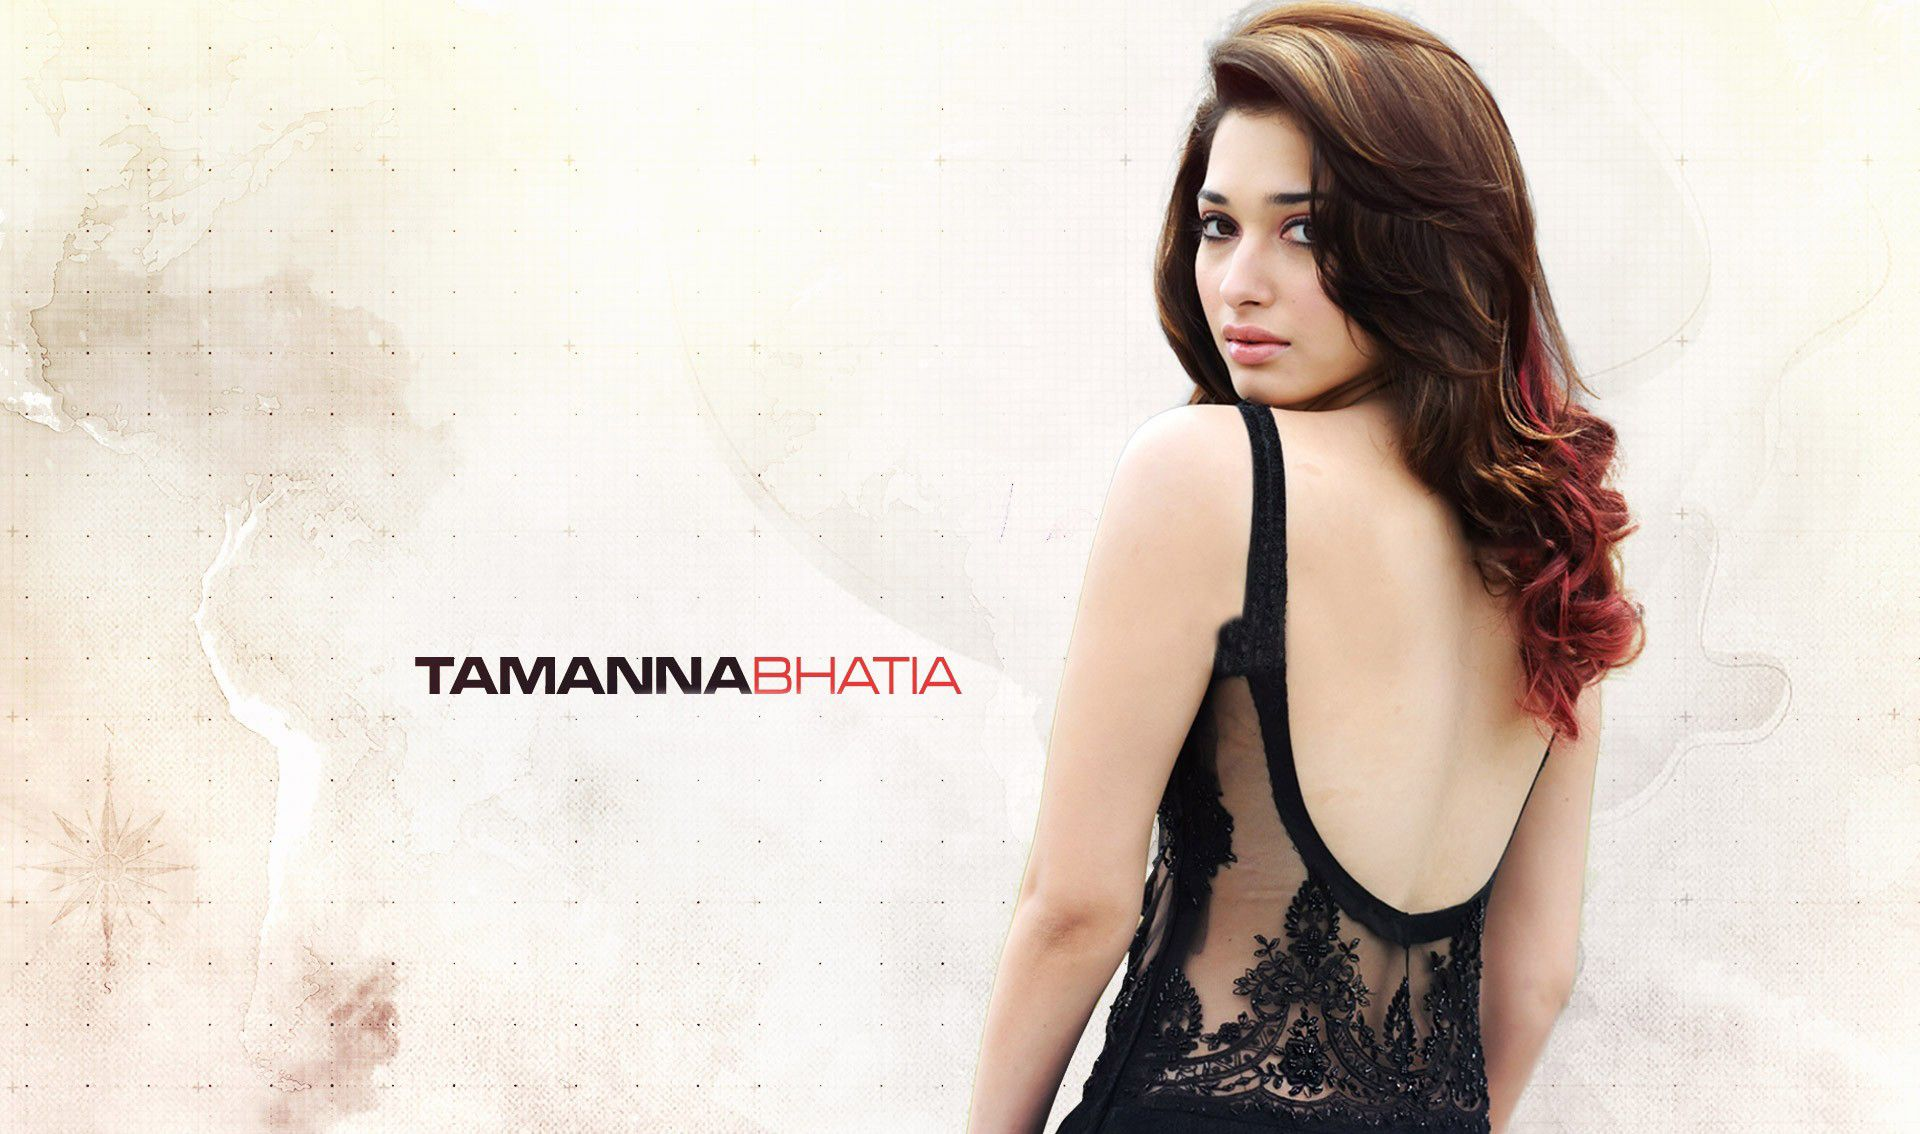 Tamanna Bhatia cute fantasy Indian girl | HD Wallpapers Rocks